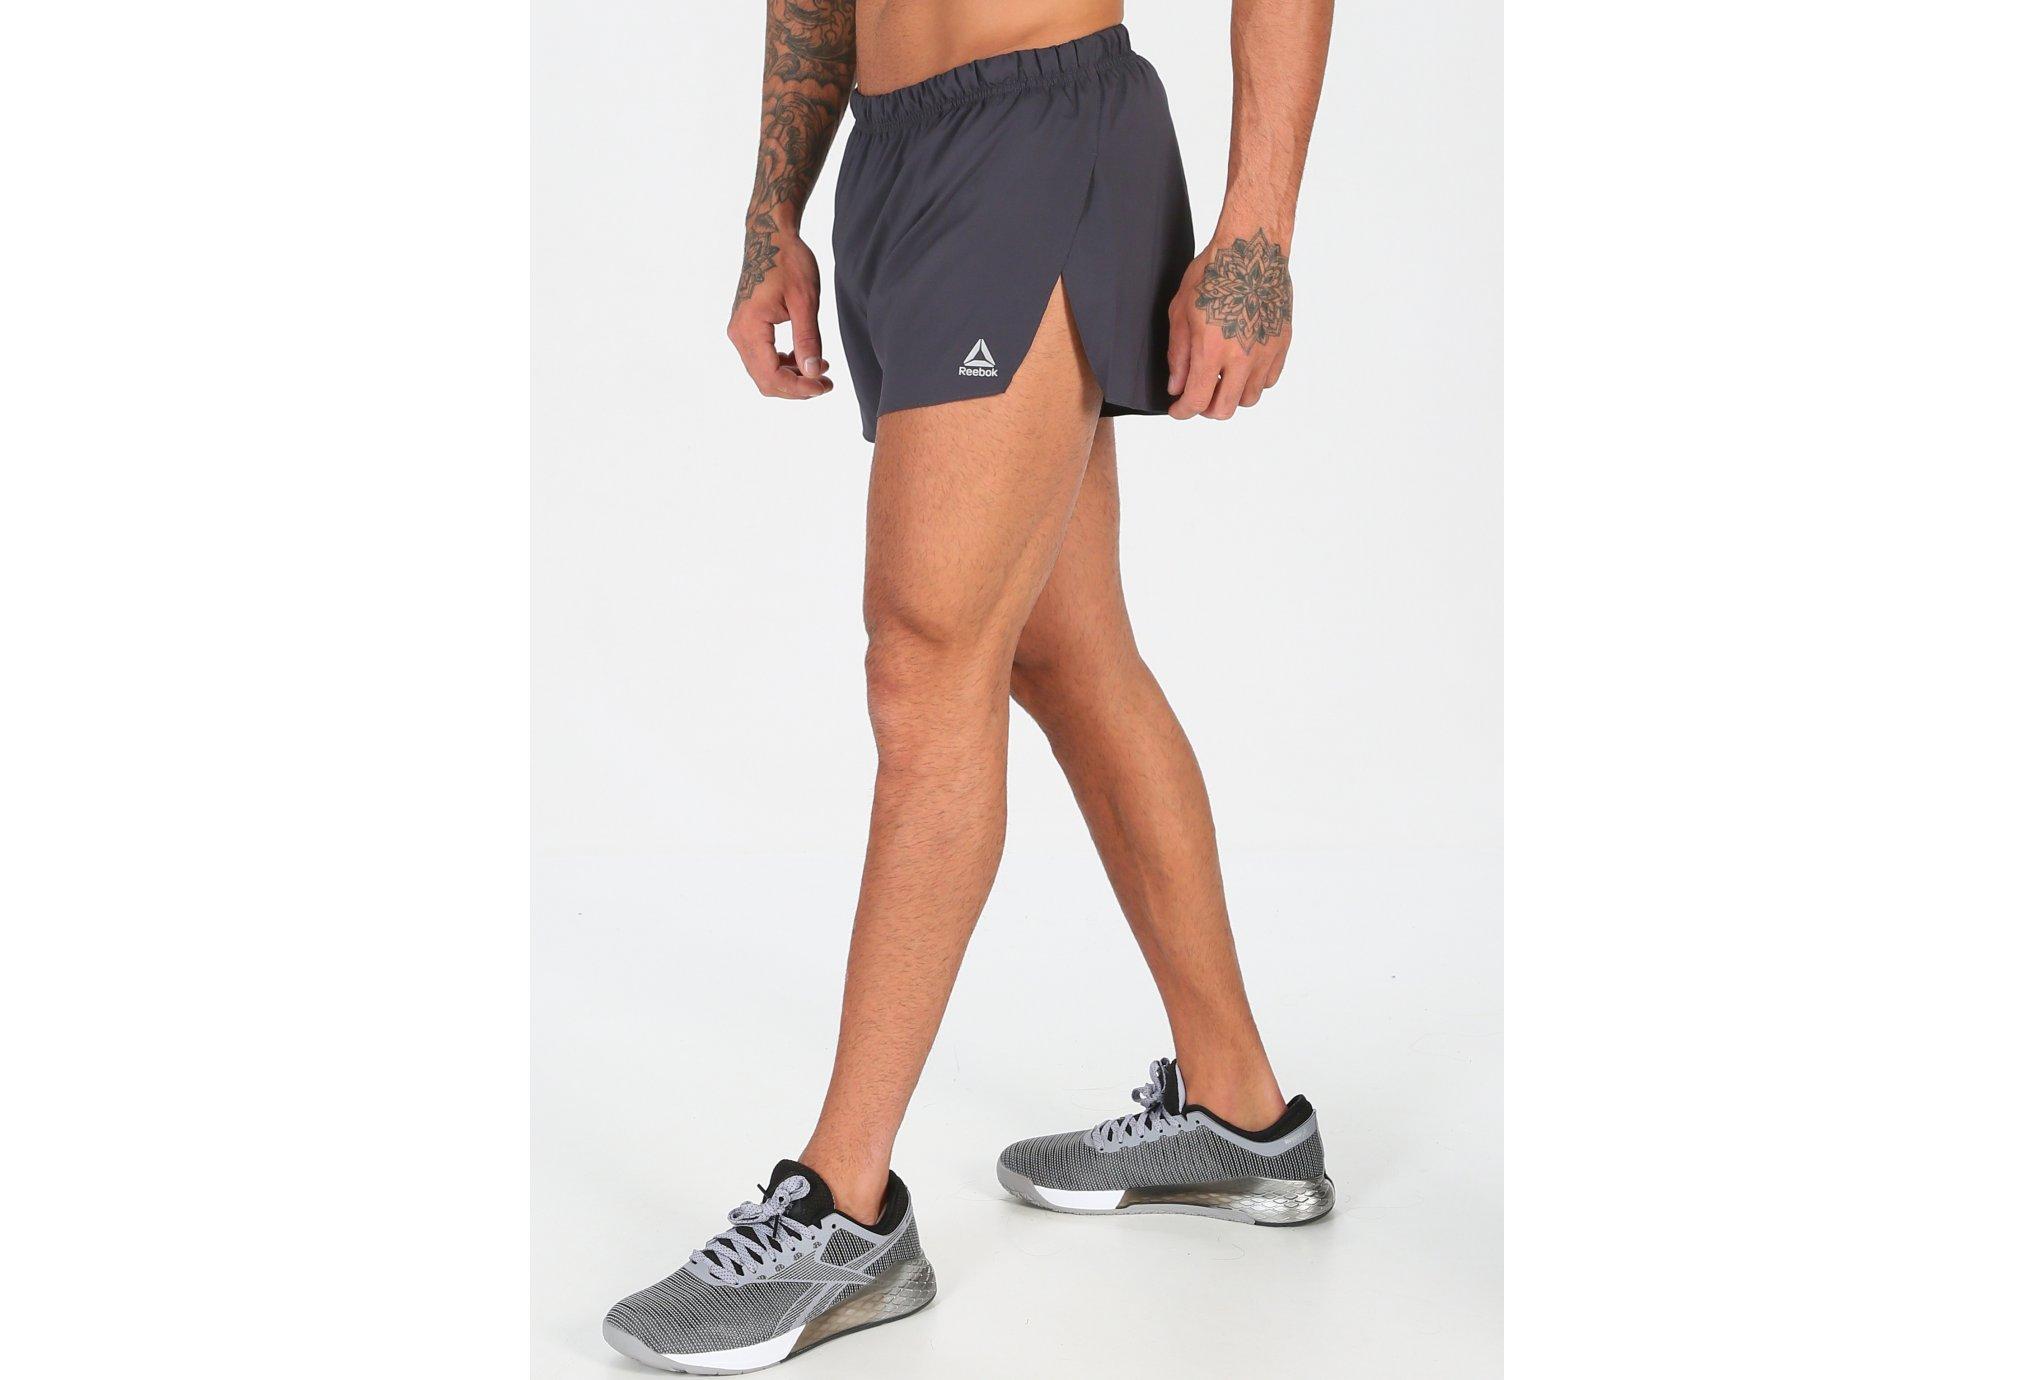 Reebok Bolton track club m vêtement running homme